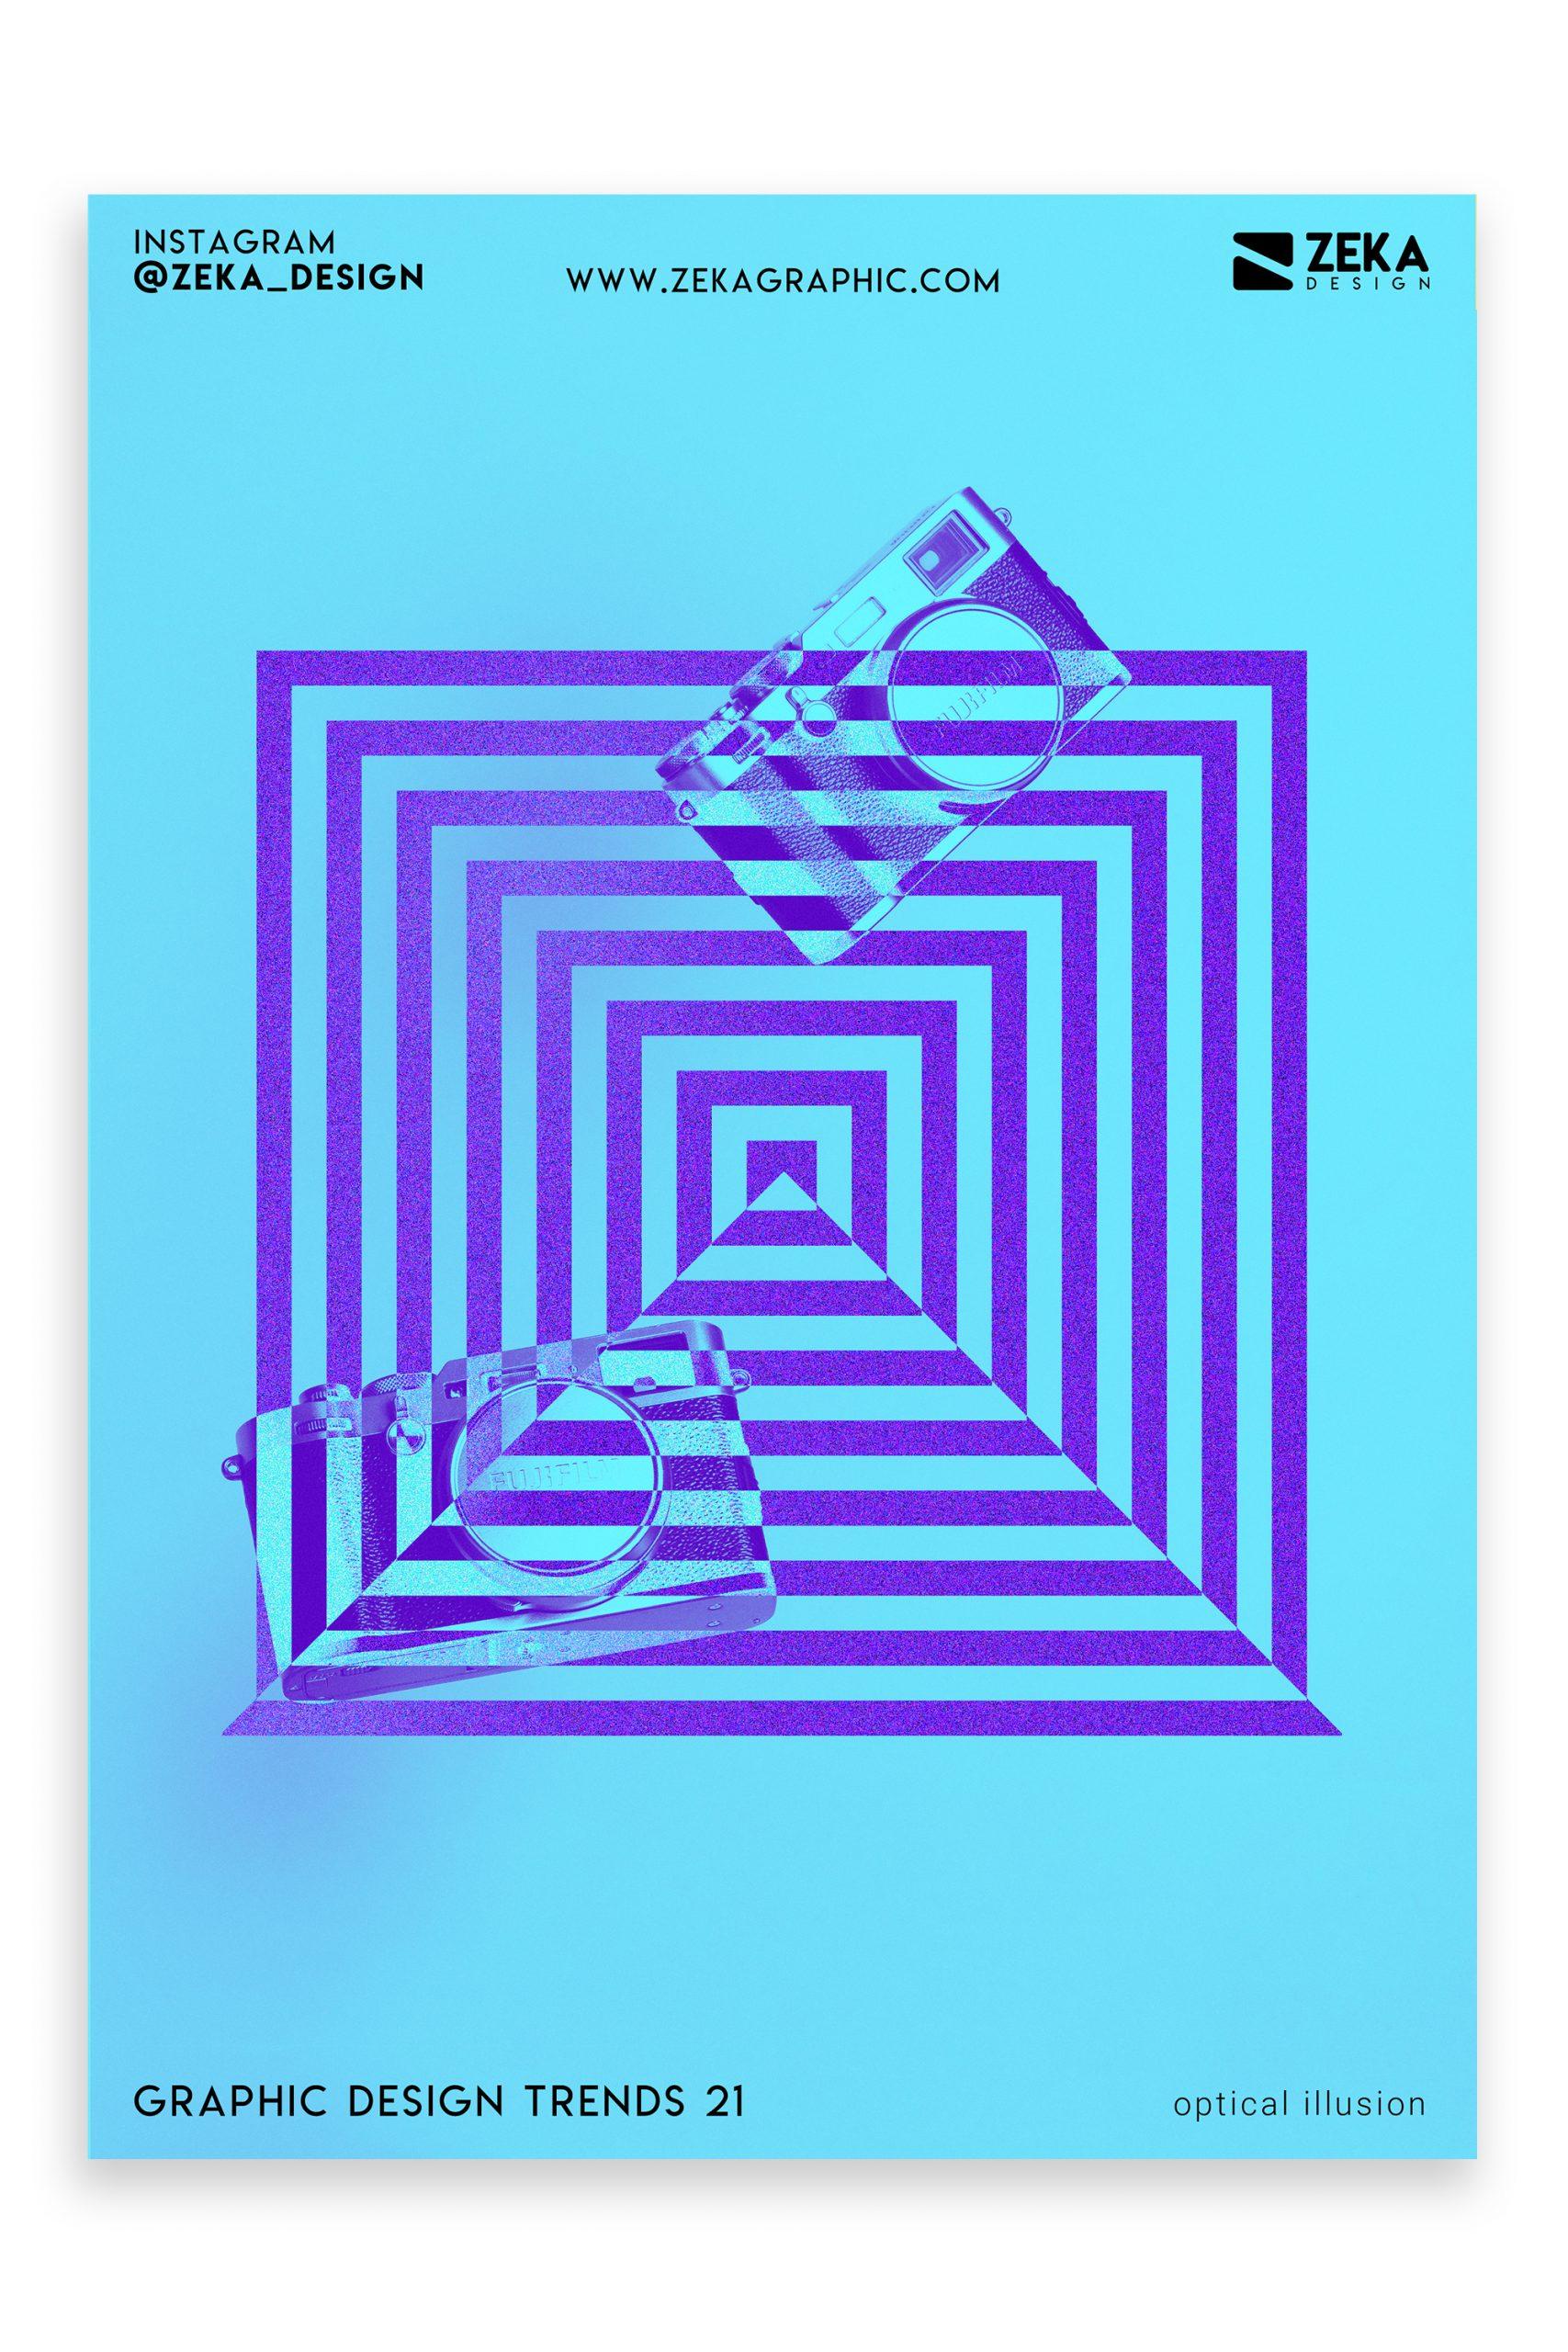 Graphic Design Trends 2021 Optical Illusion Poster